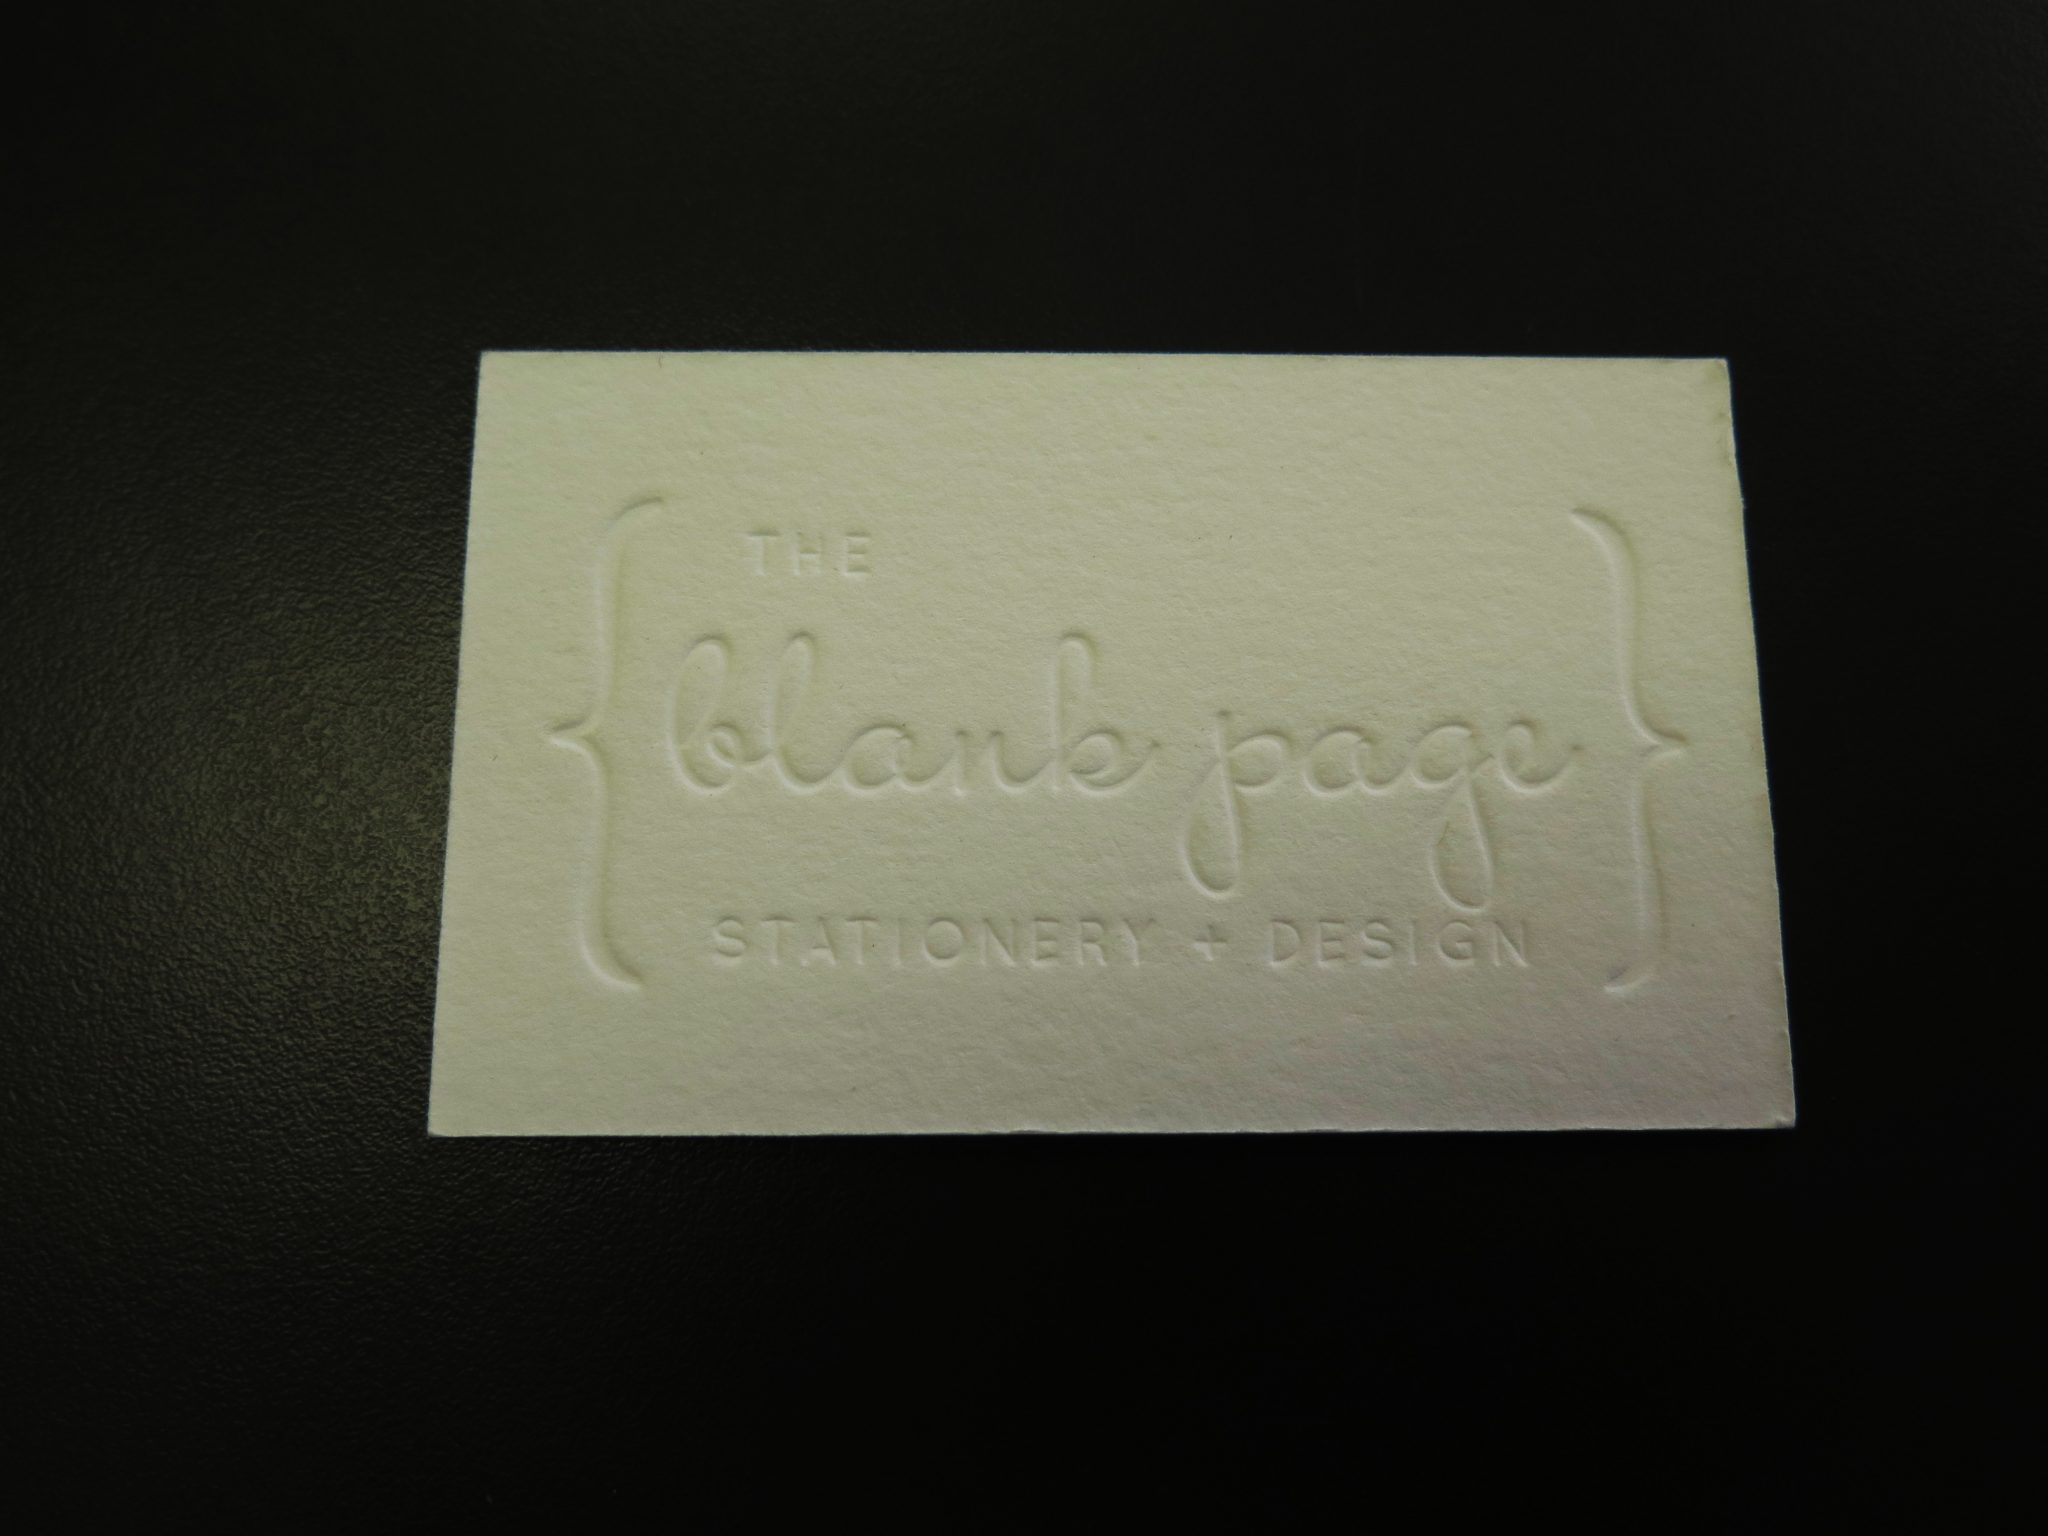 Letterpress Business Cards - Minuteman Press